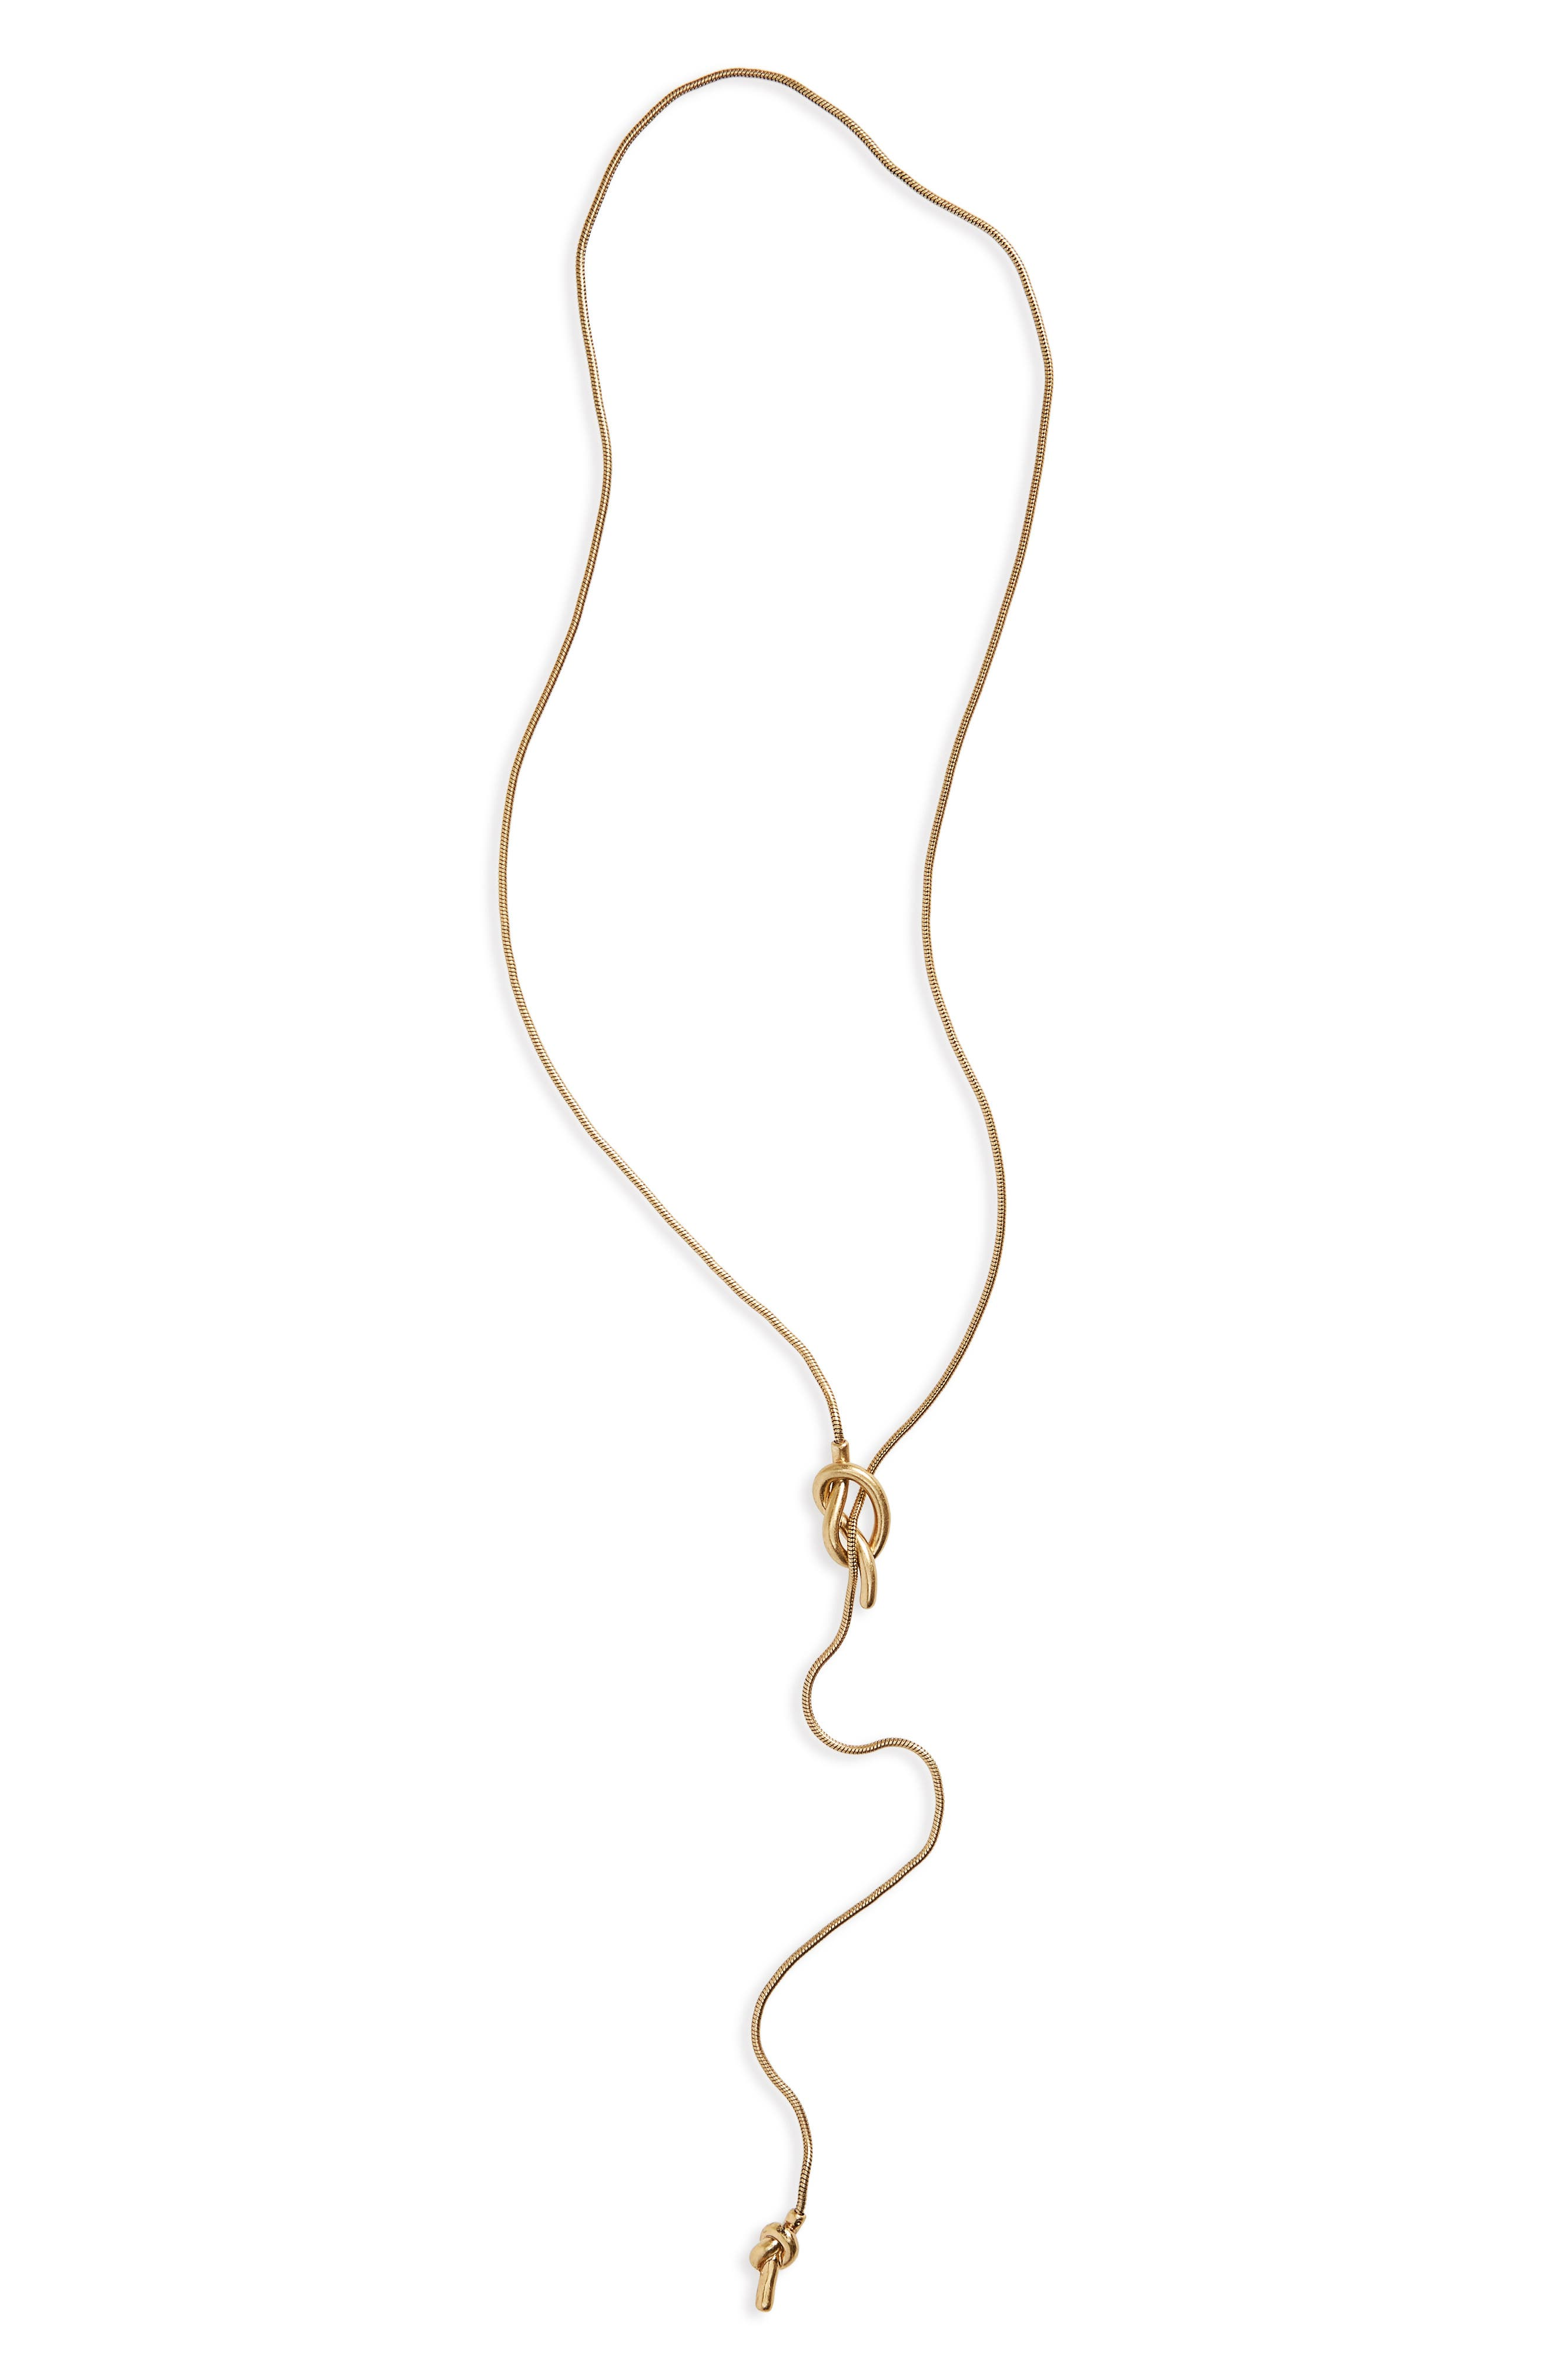 Main Image - Madewell 'Knotshine' Necklace